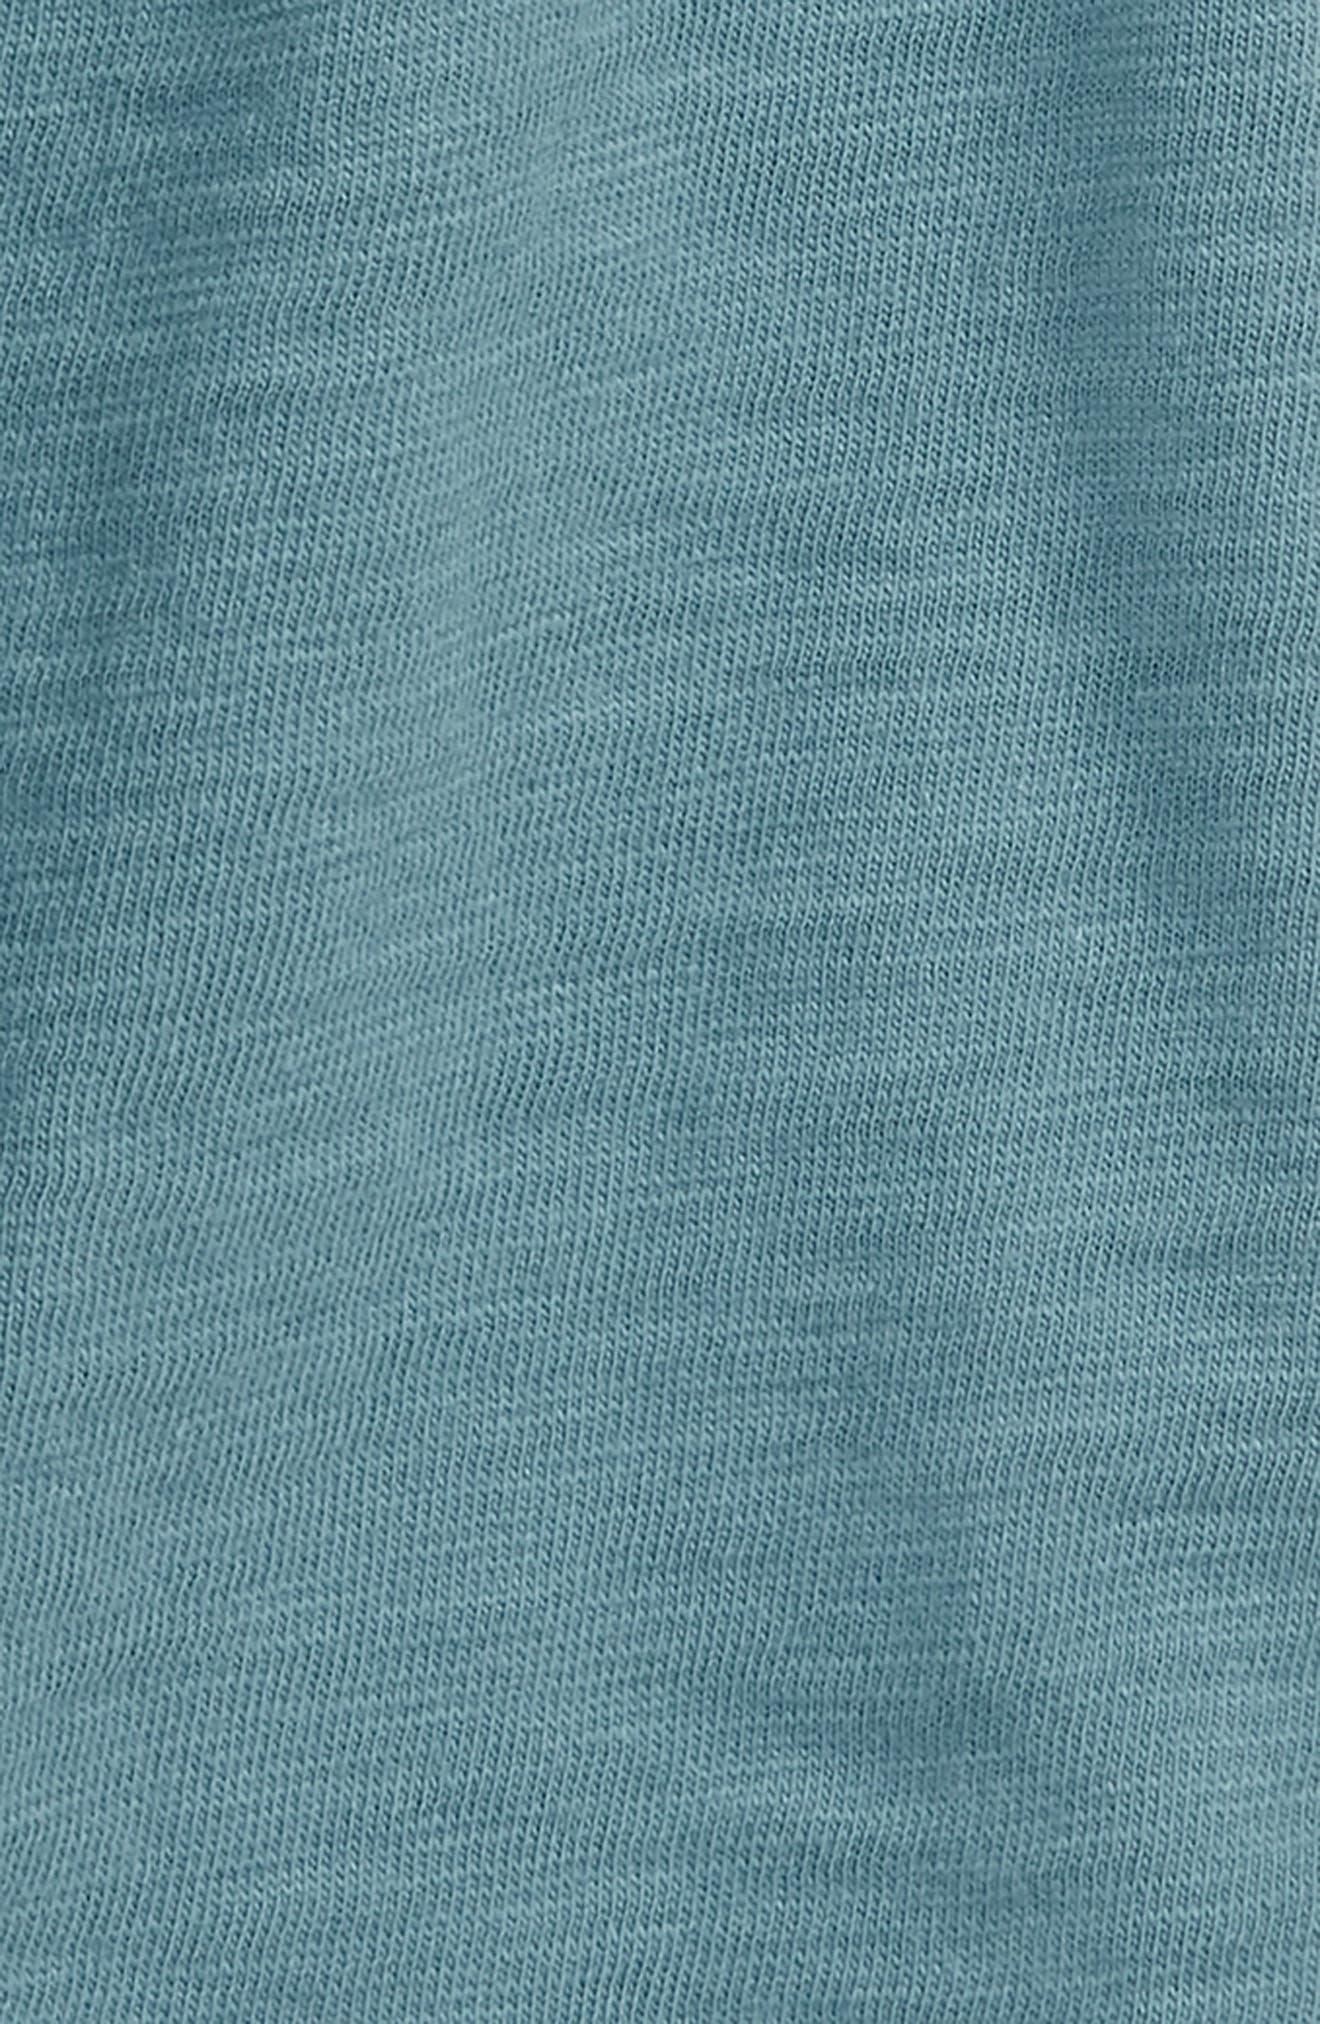 Peek Happy Shorts,                             Alternate thumbnail 2, color,                             Blue